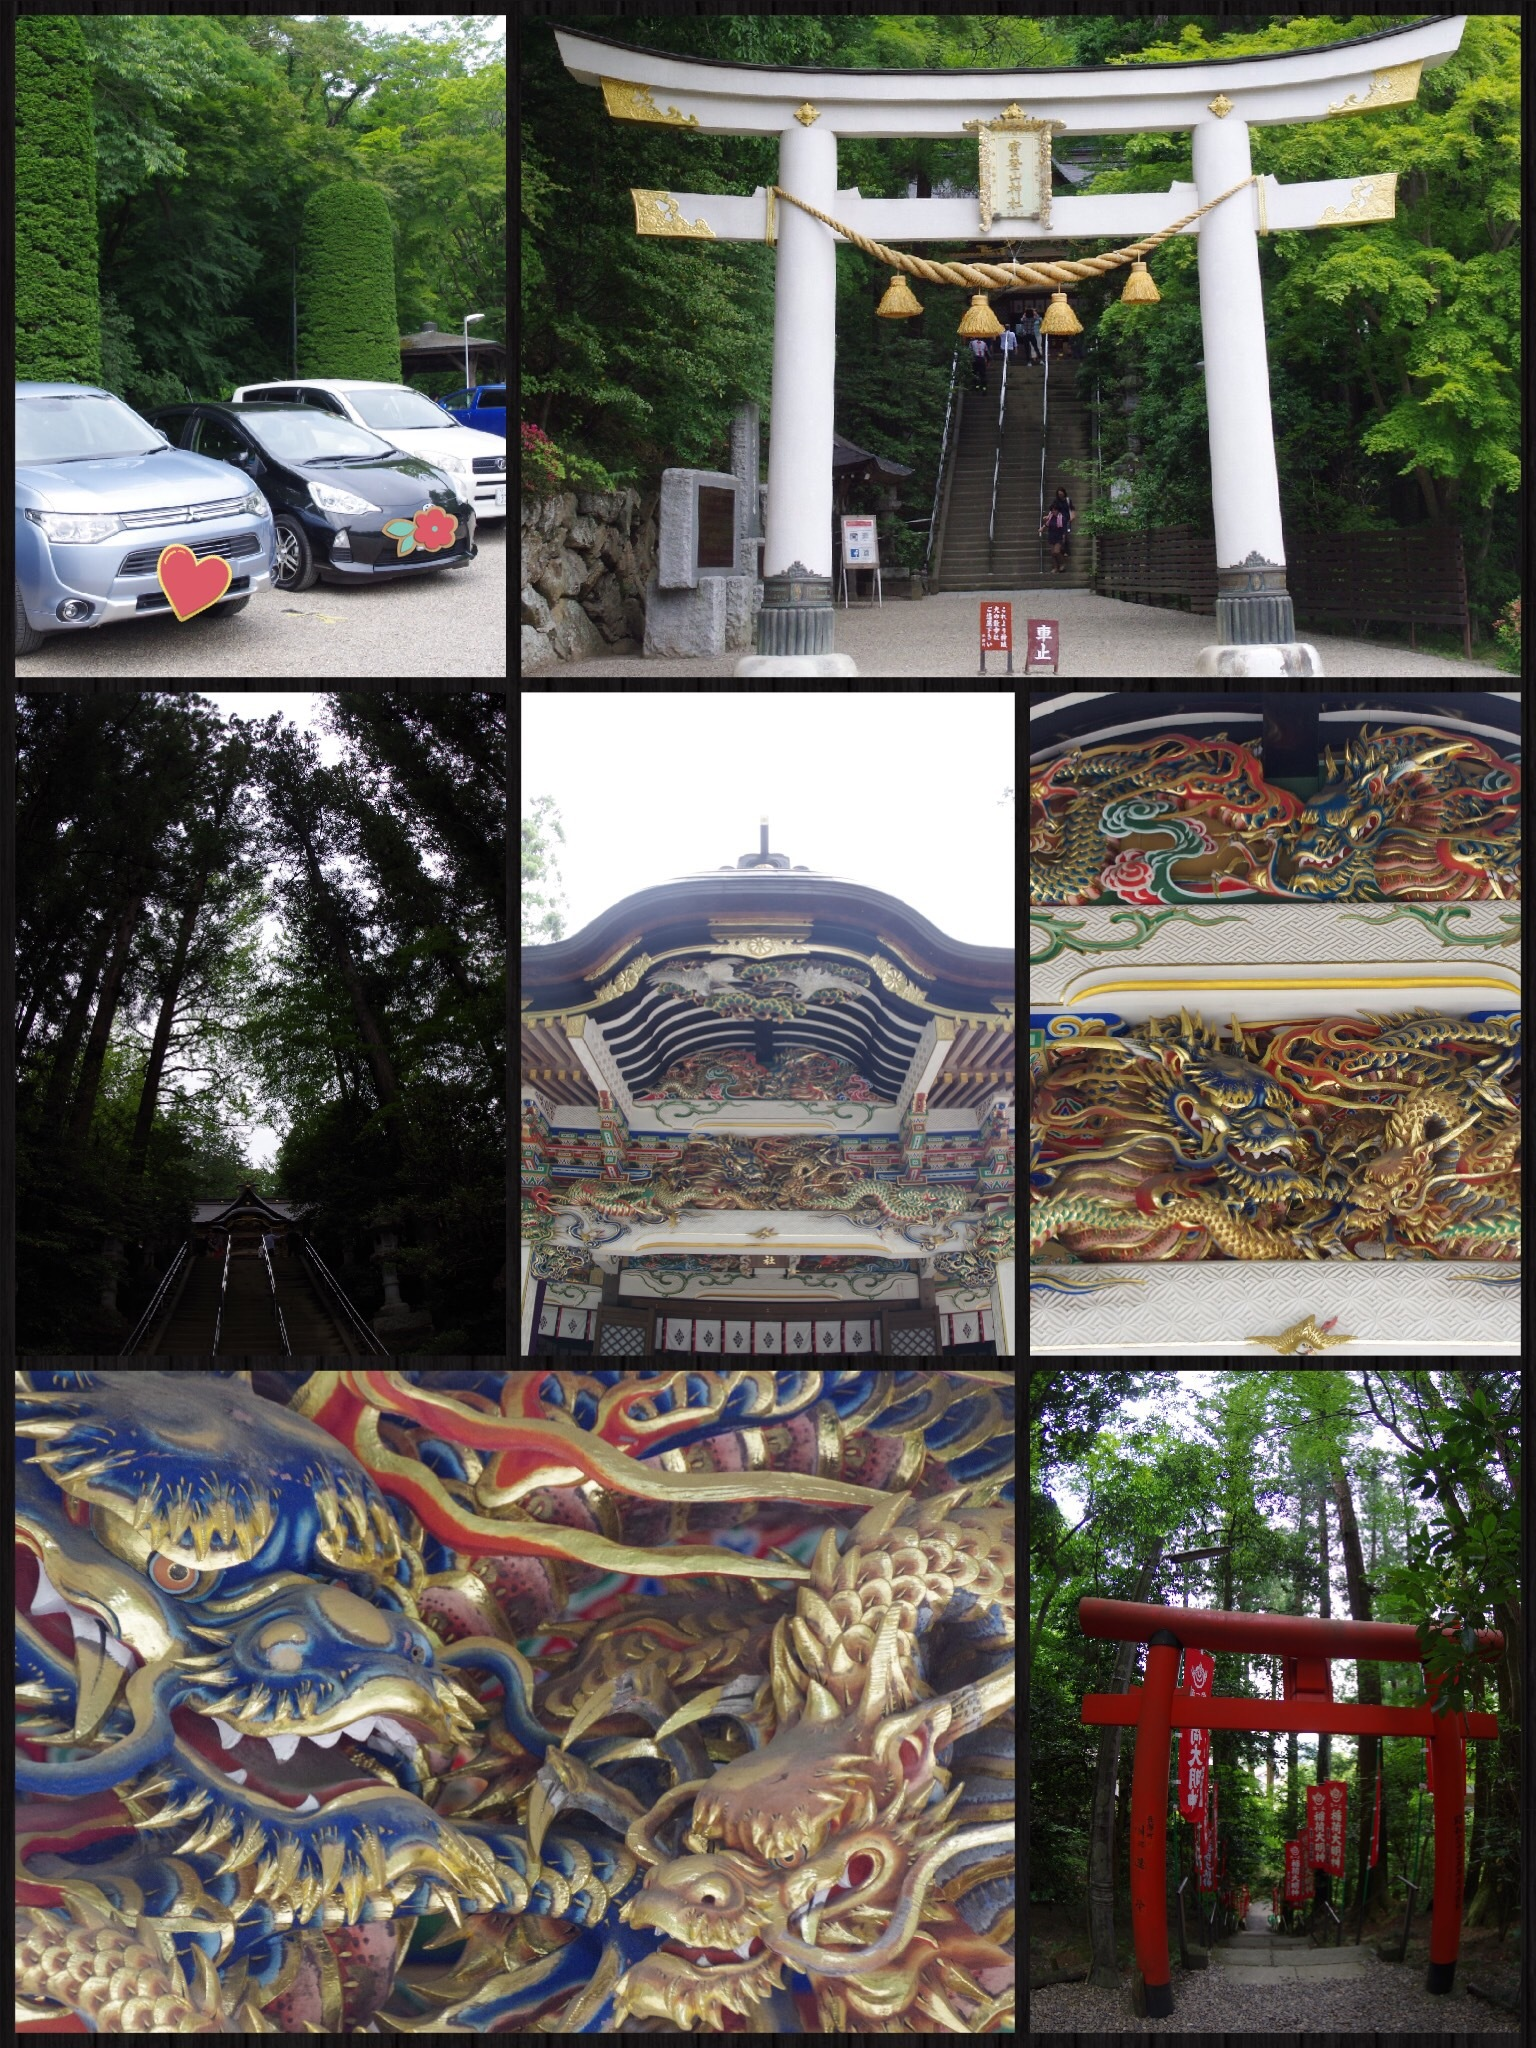 「PICA秩父グランオーベルジュコテージ」宿泊記 長瀞宝登山神社